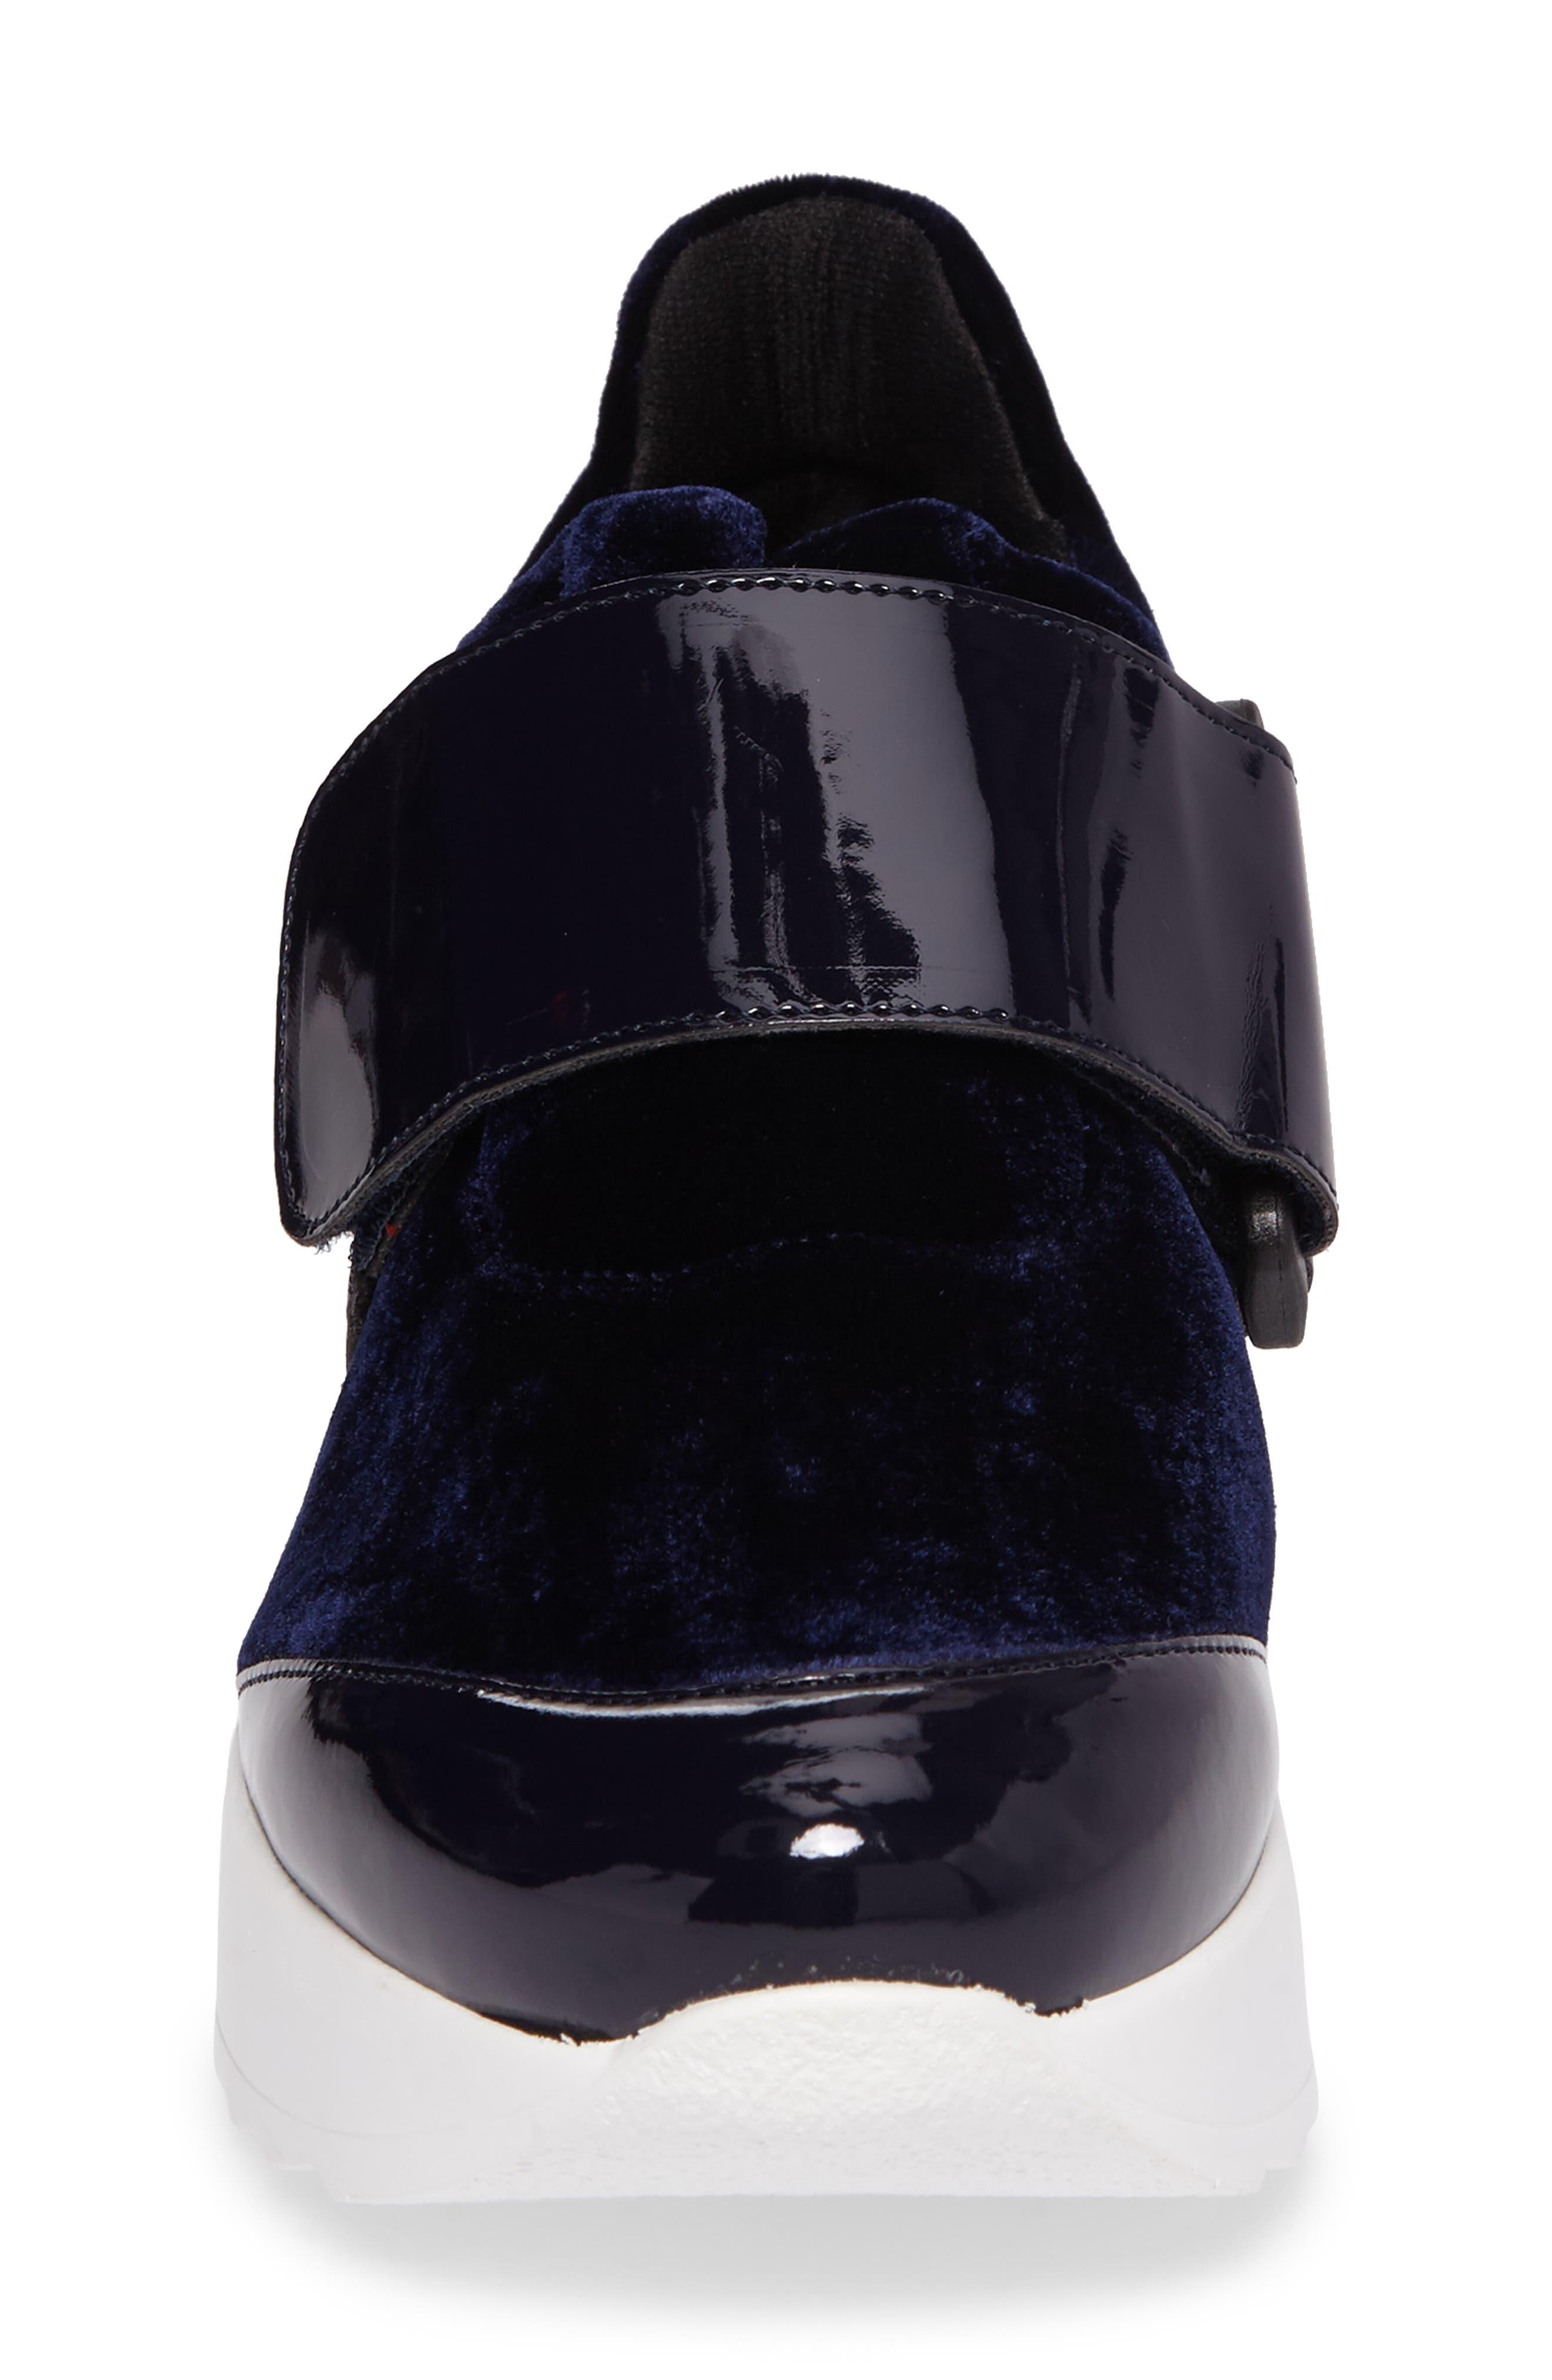 Cannon Sneaker,                             Alternate thumbnail 4, color,                             Navy